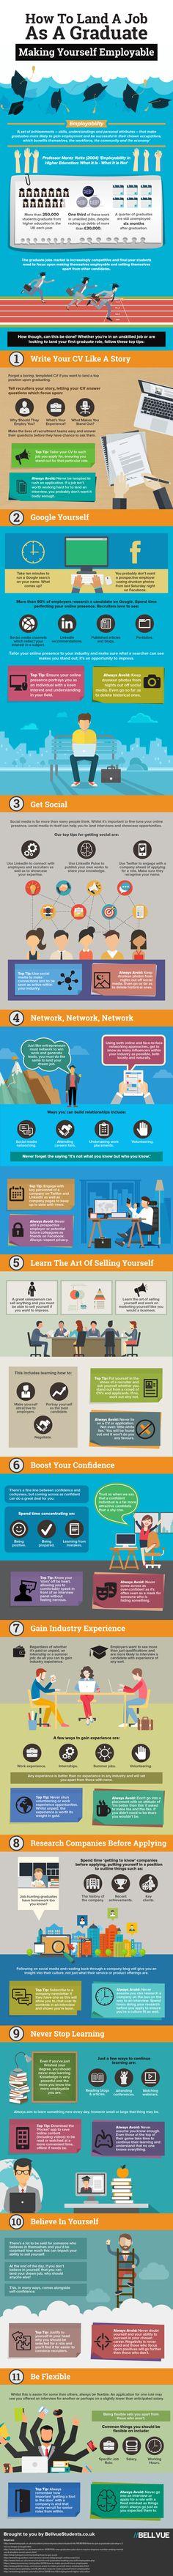 @resumedesignco ResumeDesignCo.com Making Yourself Employable: How To Land A Job As A Graduate #Infographic #Career #Job